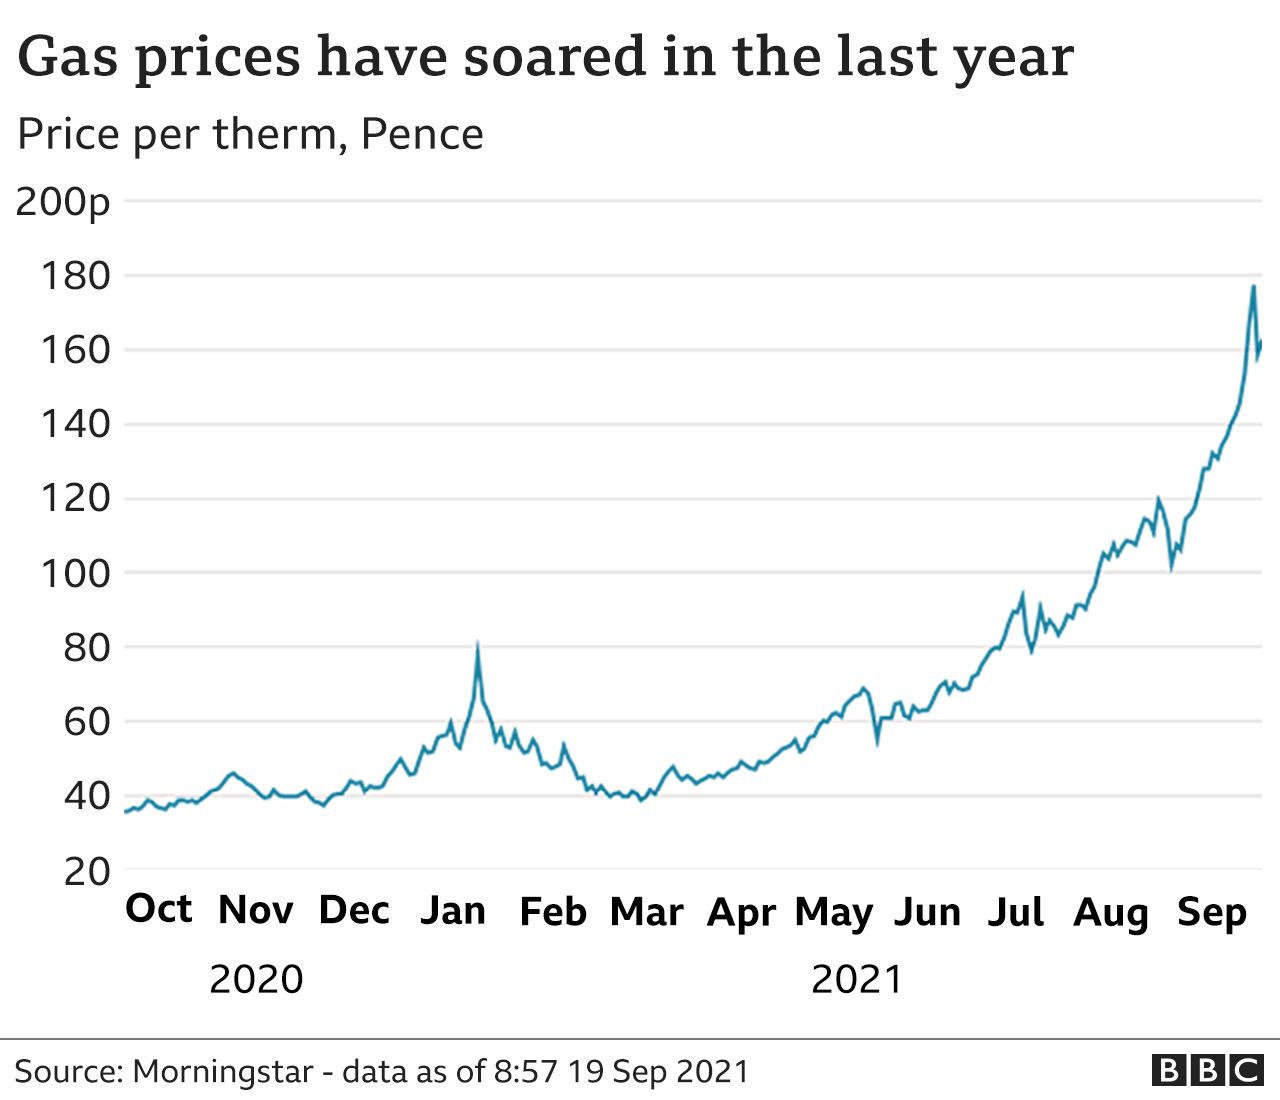 Wholesale gas prices